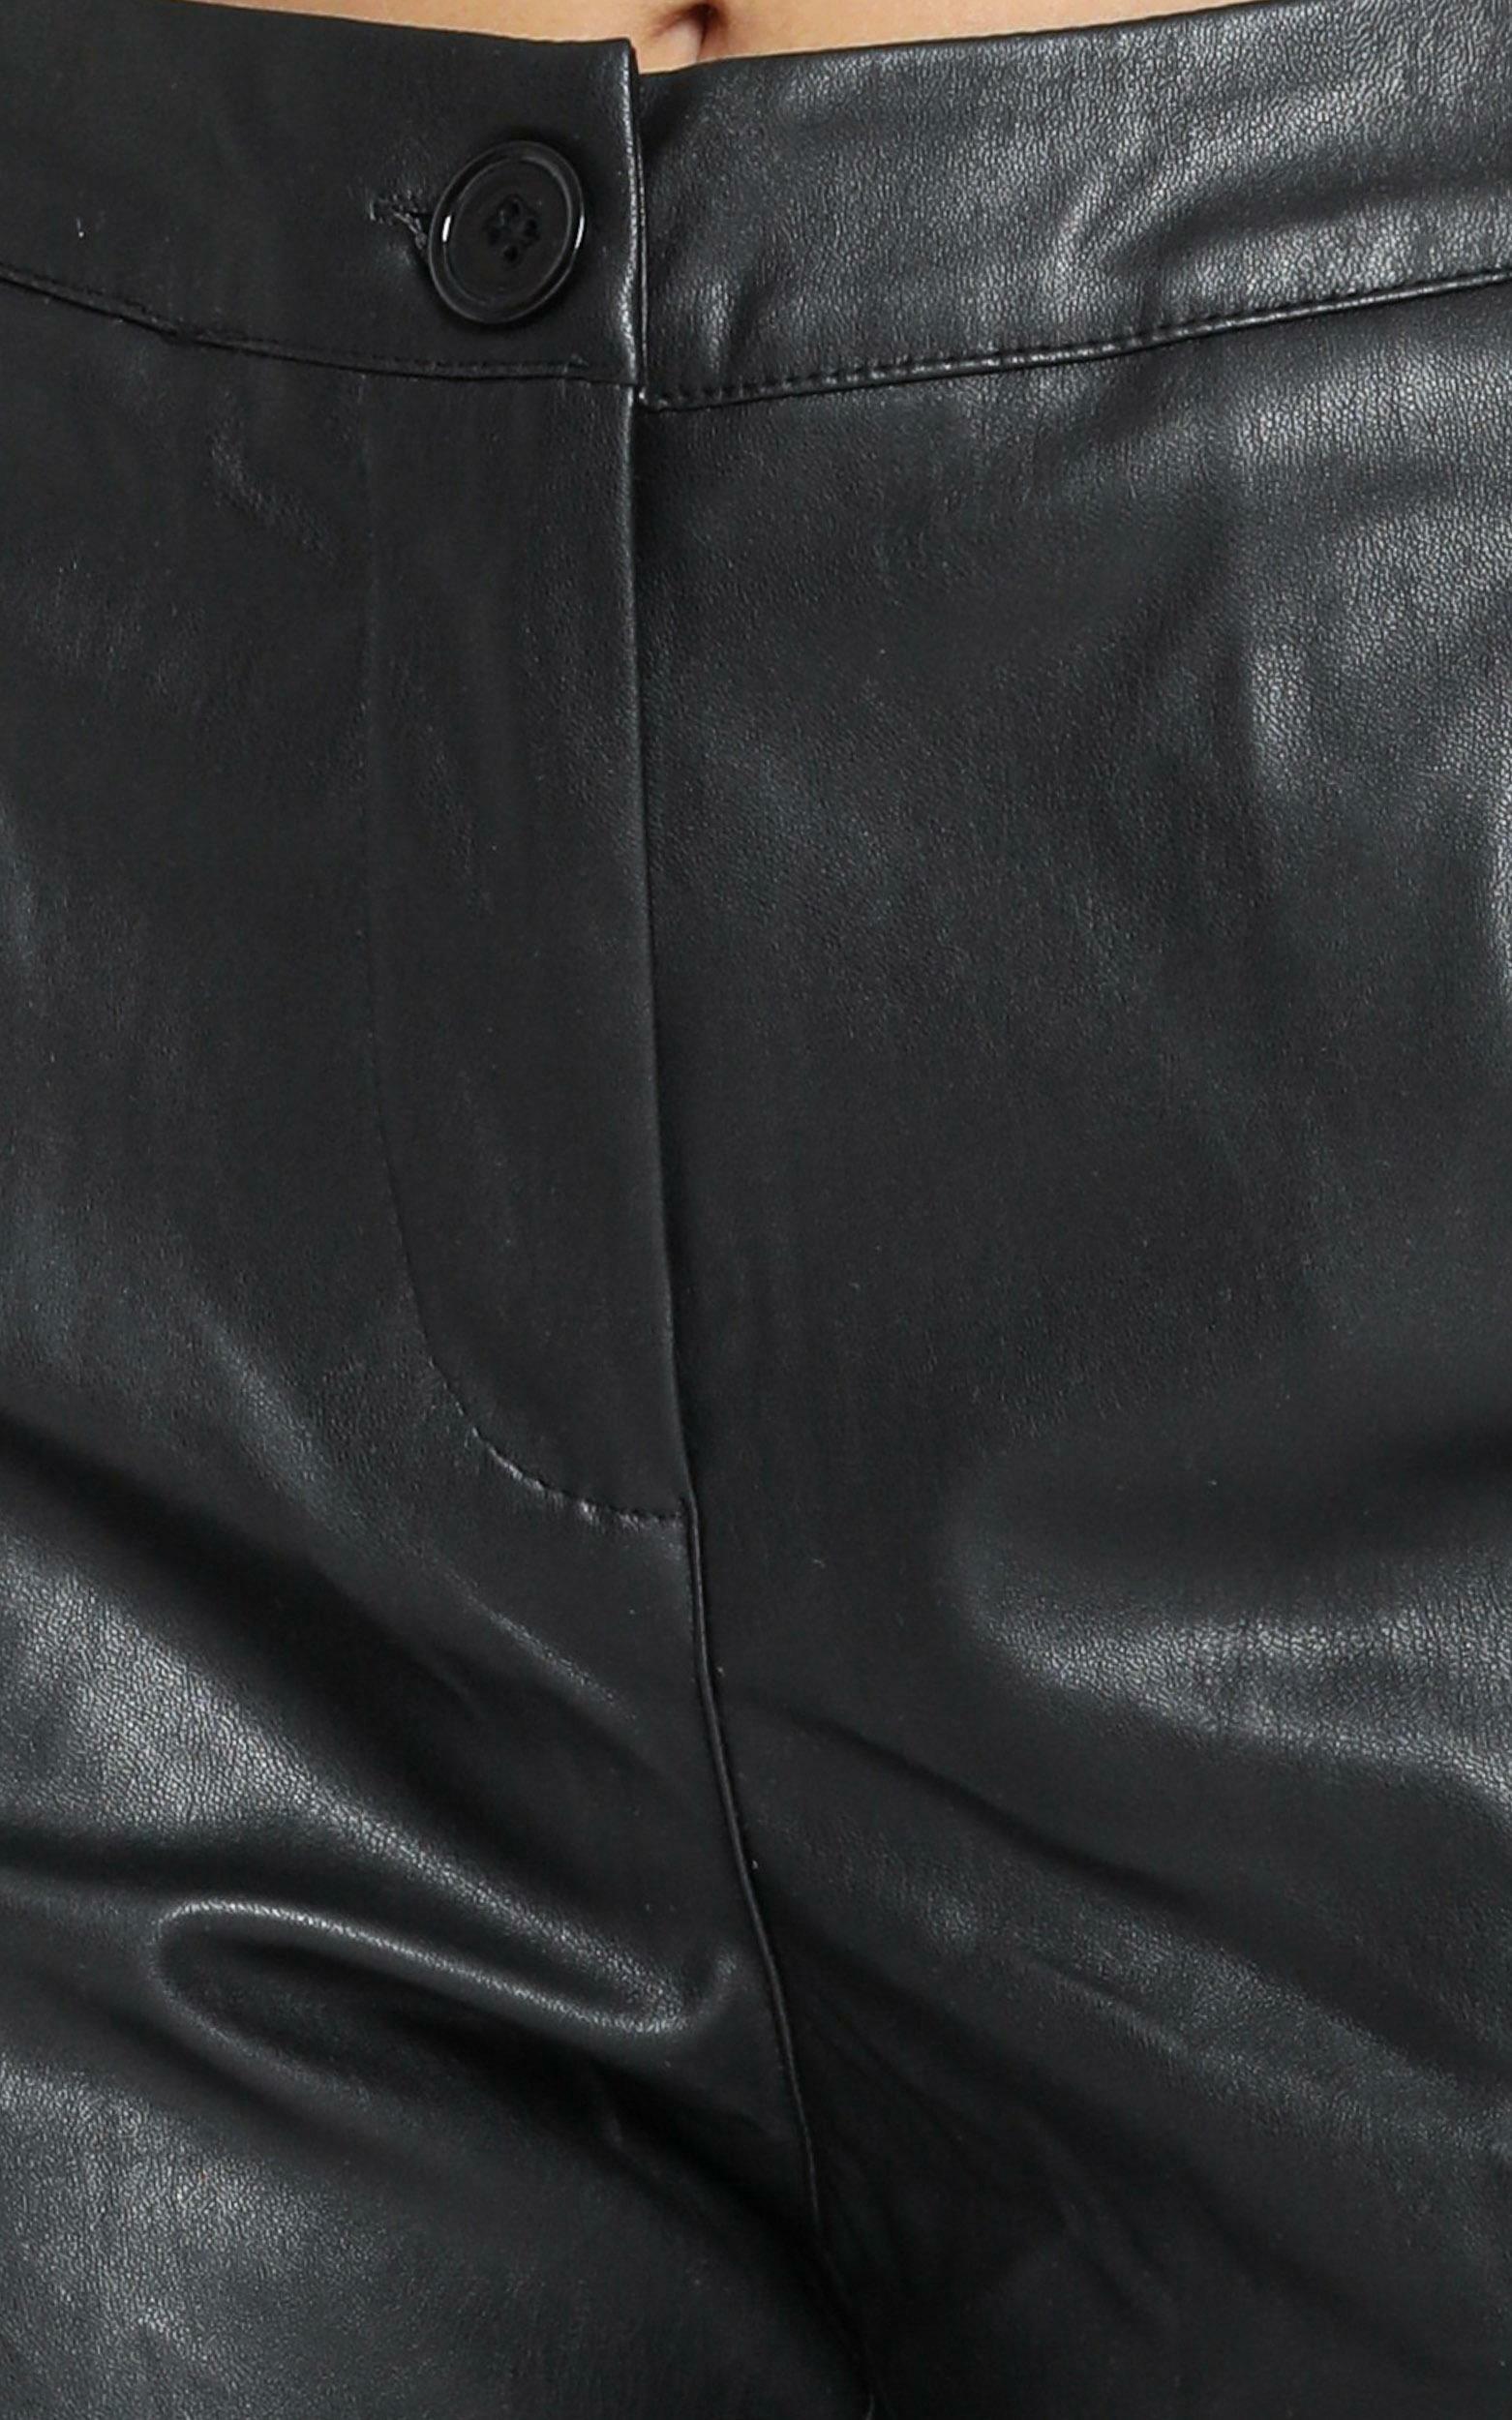 Owen Pants in Black Leatherette - 6 (XS), Black, hi-res image number null